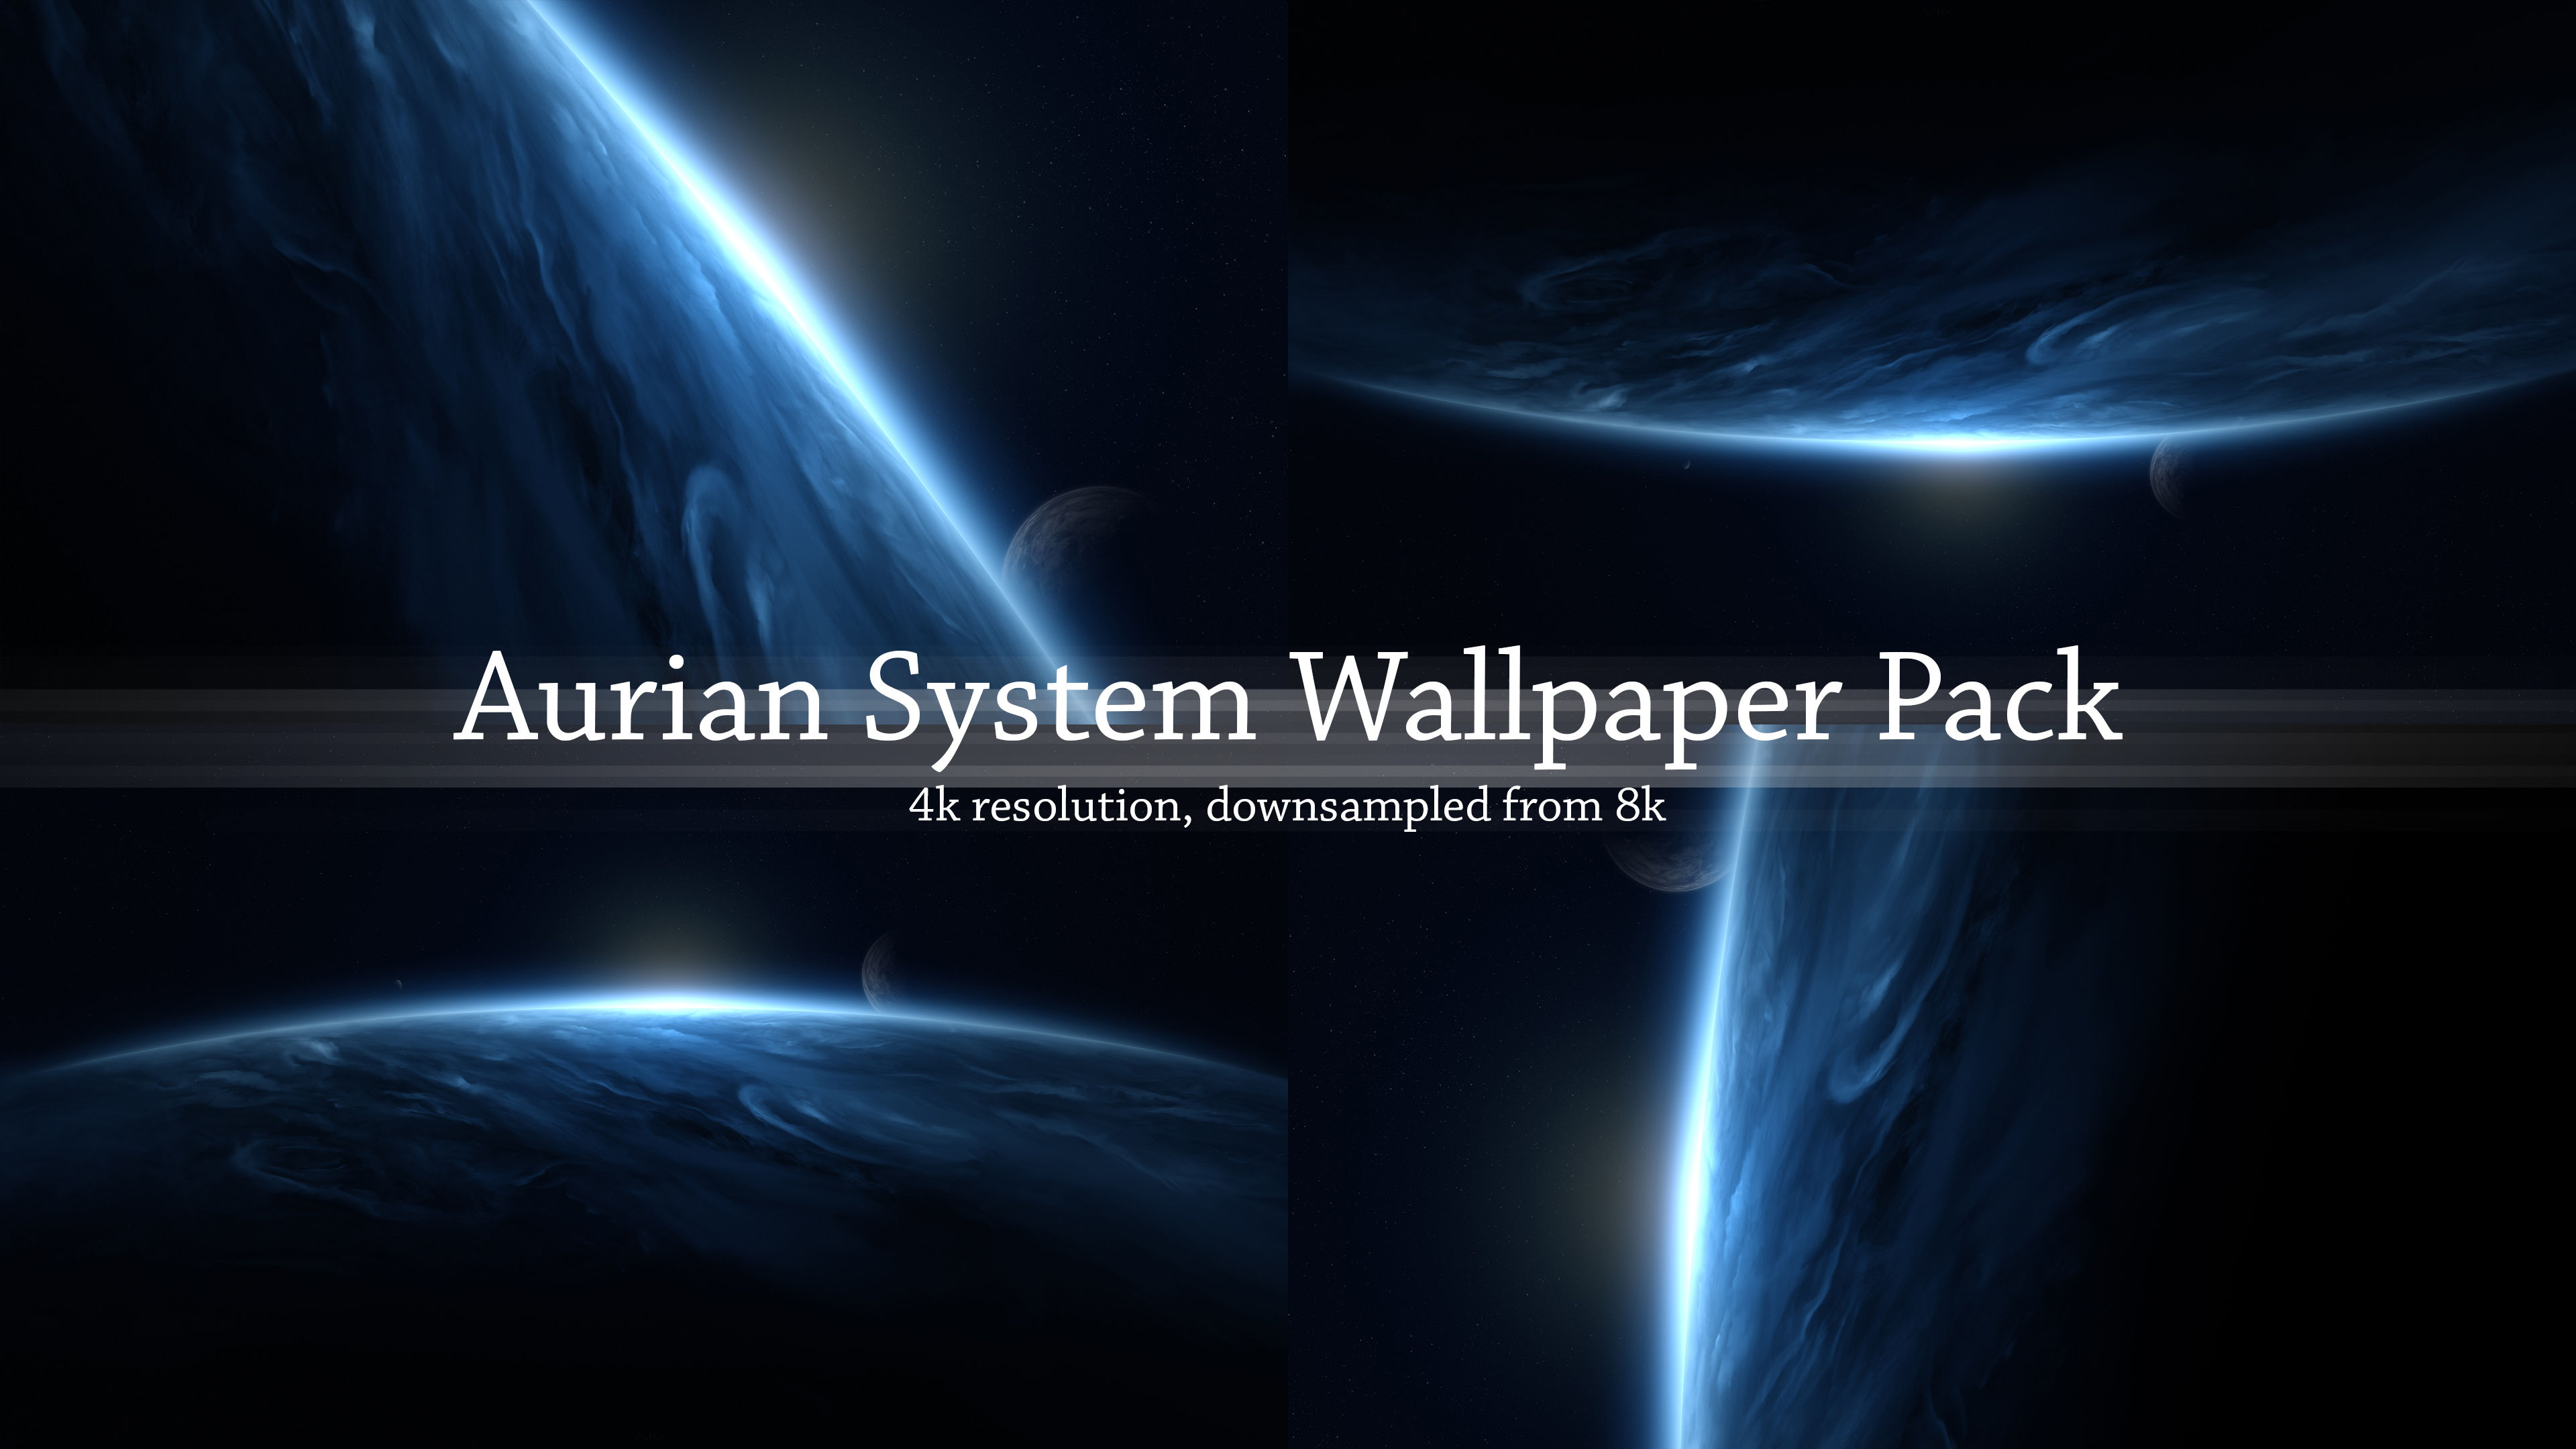 Aurian System by Starkiteckt